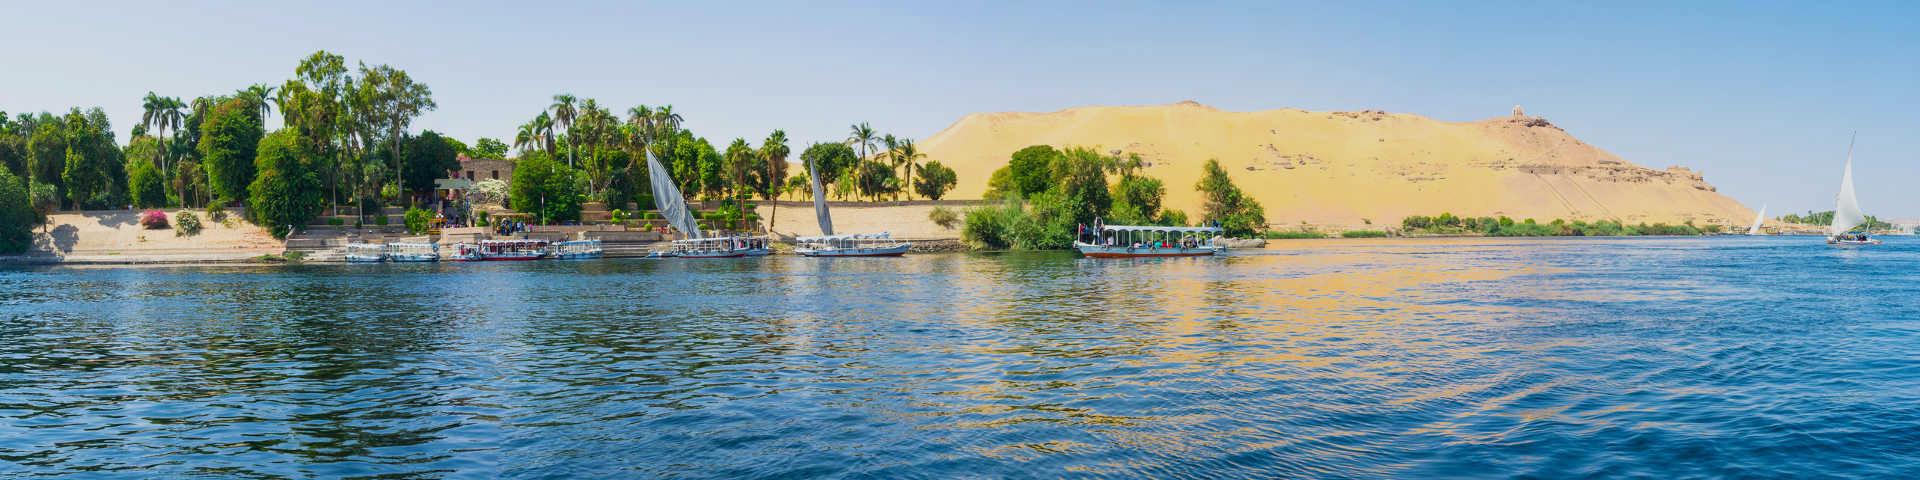 Aswan hero edit